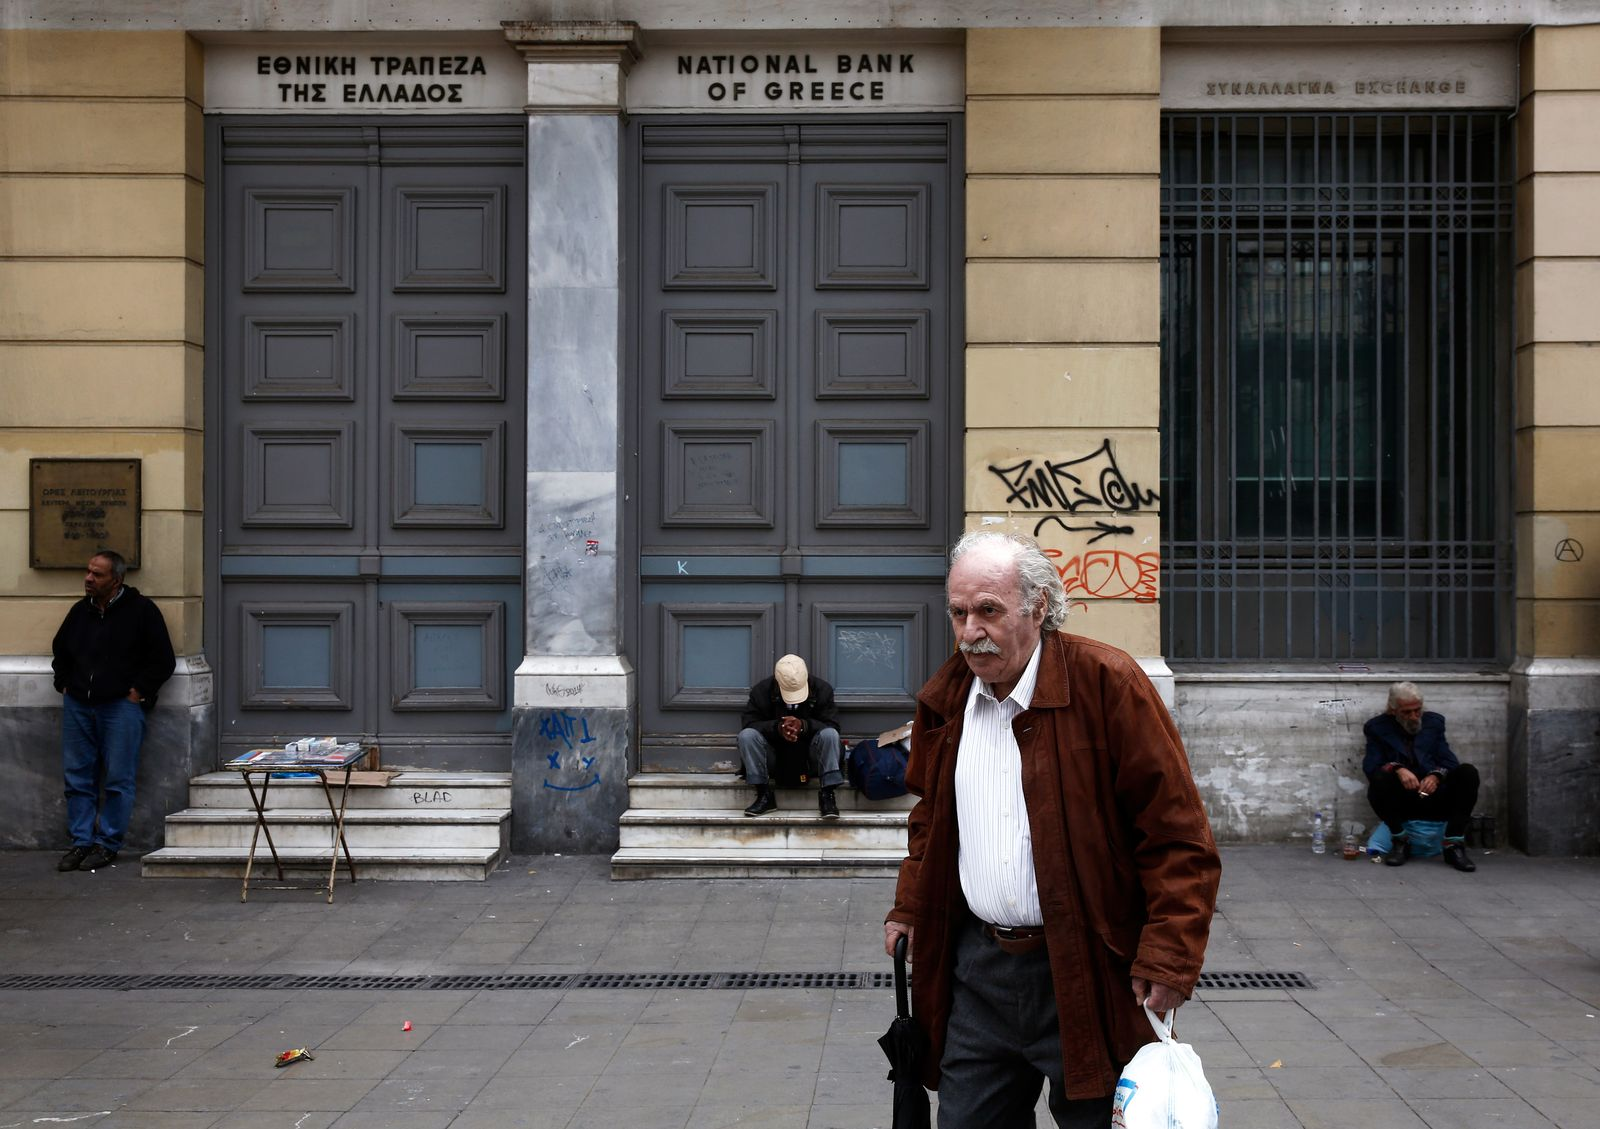 Griechenland / Finanzkrise / Bank of Greece